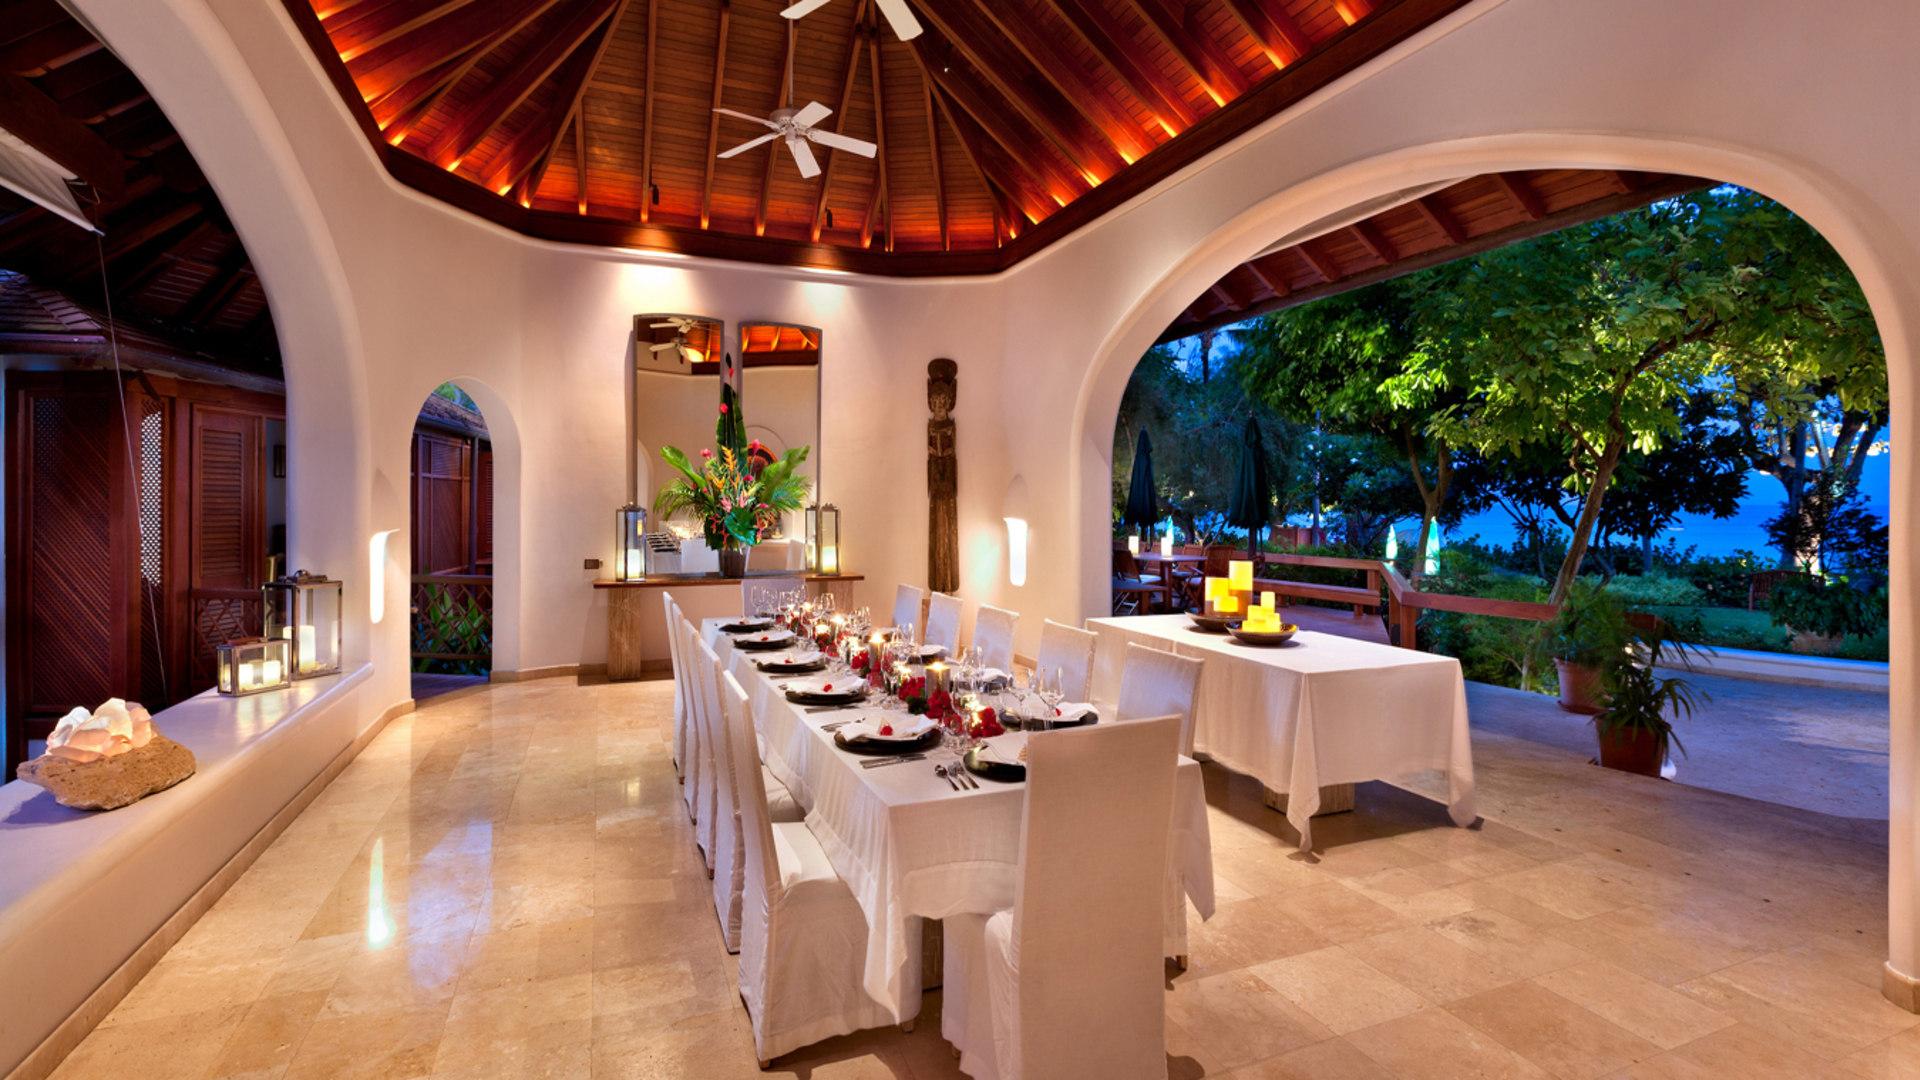 Impressive dining room